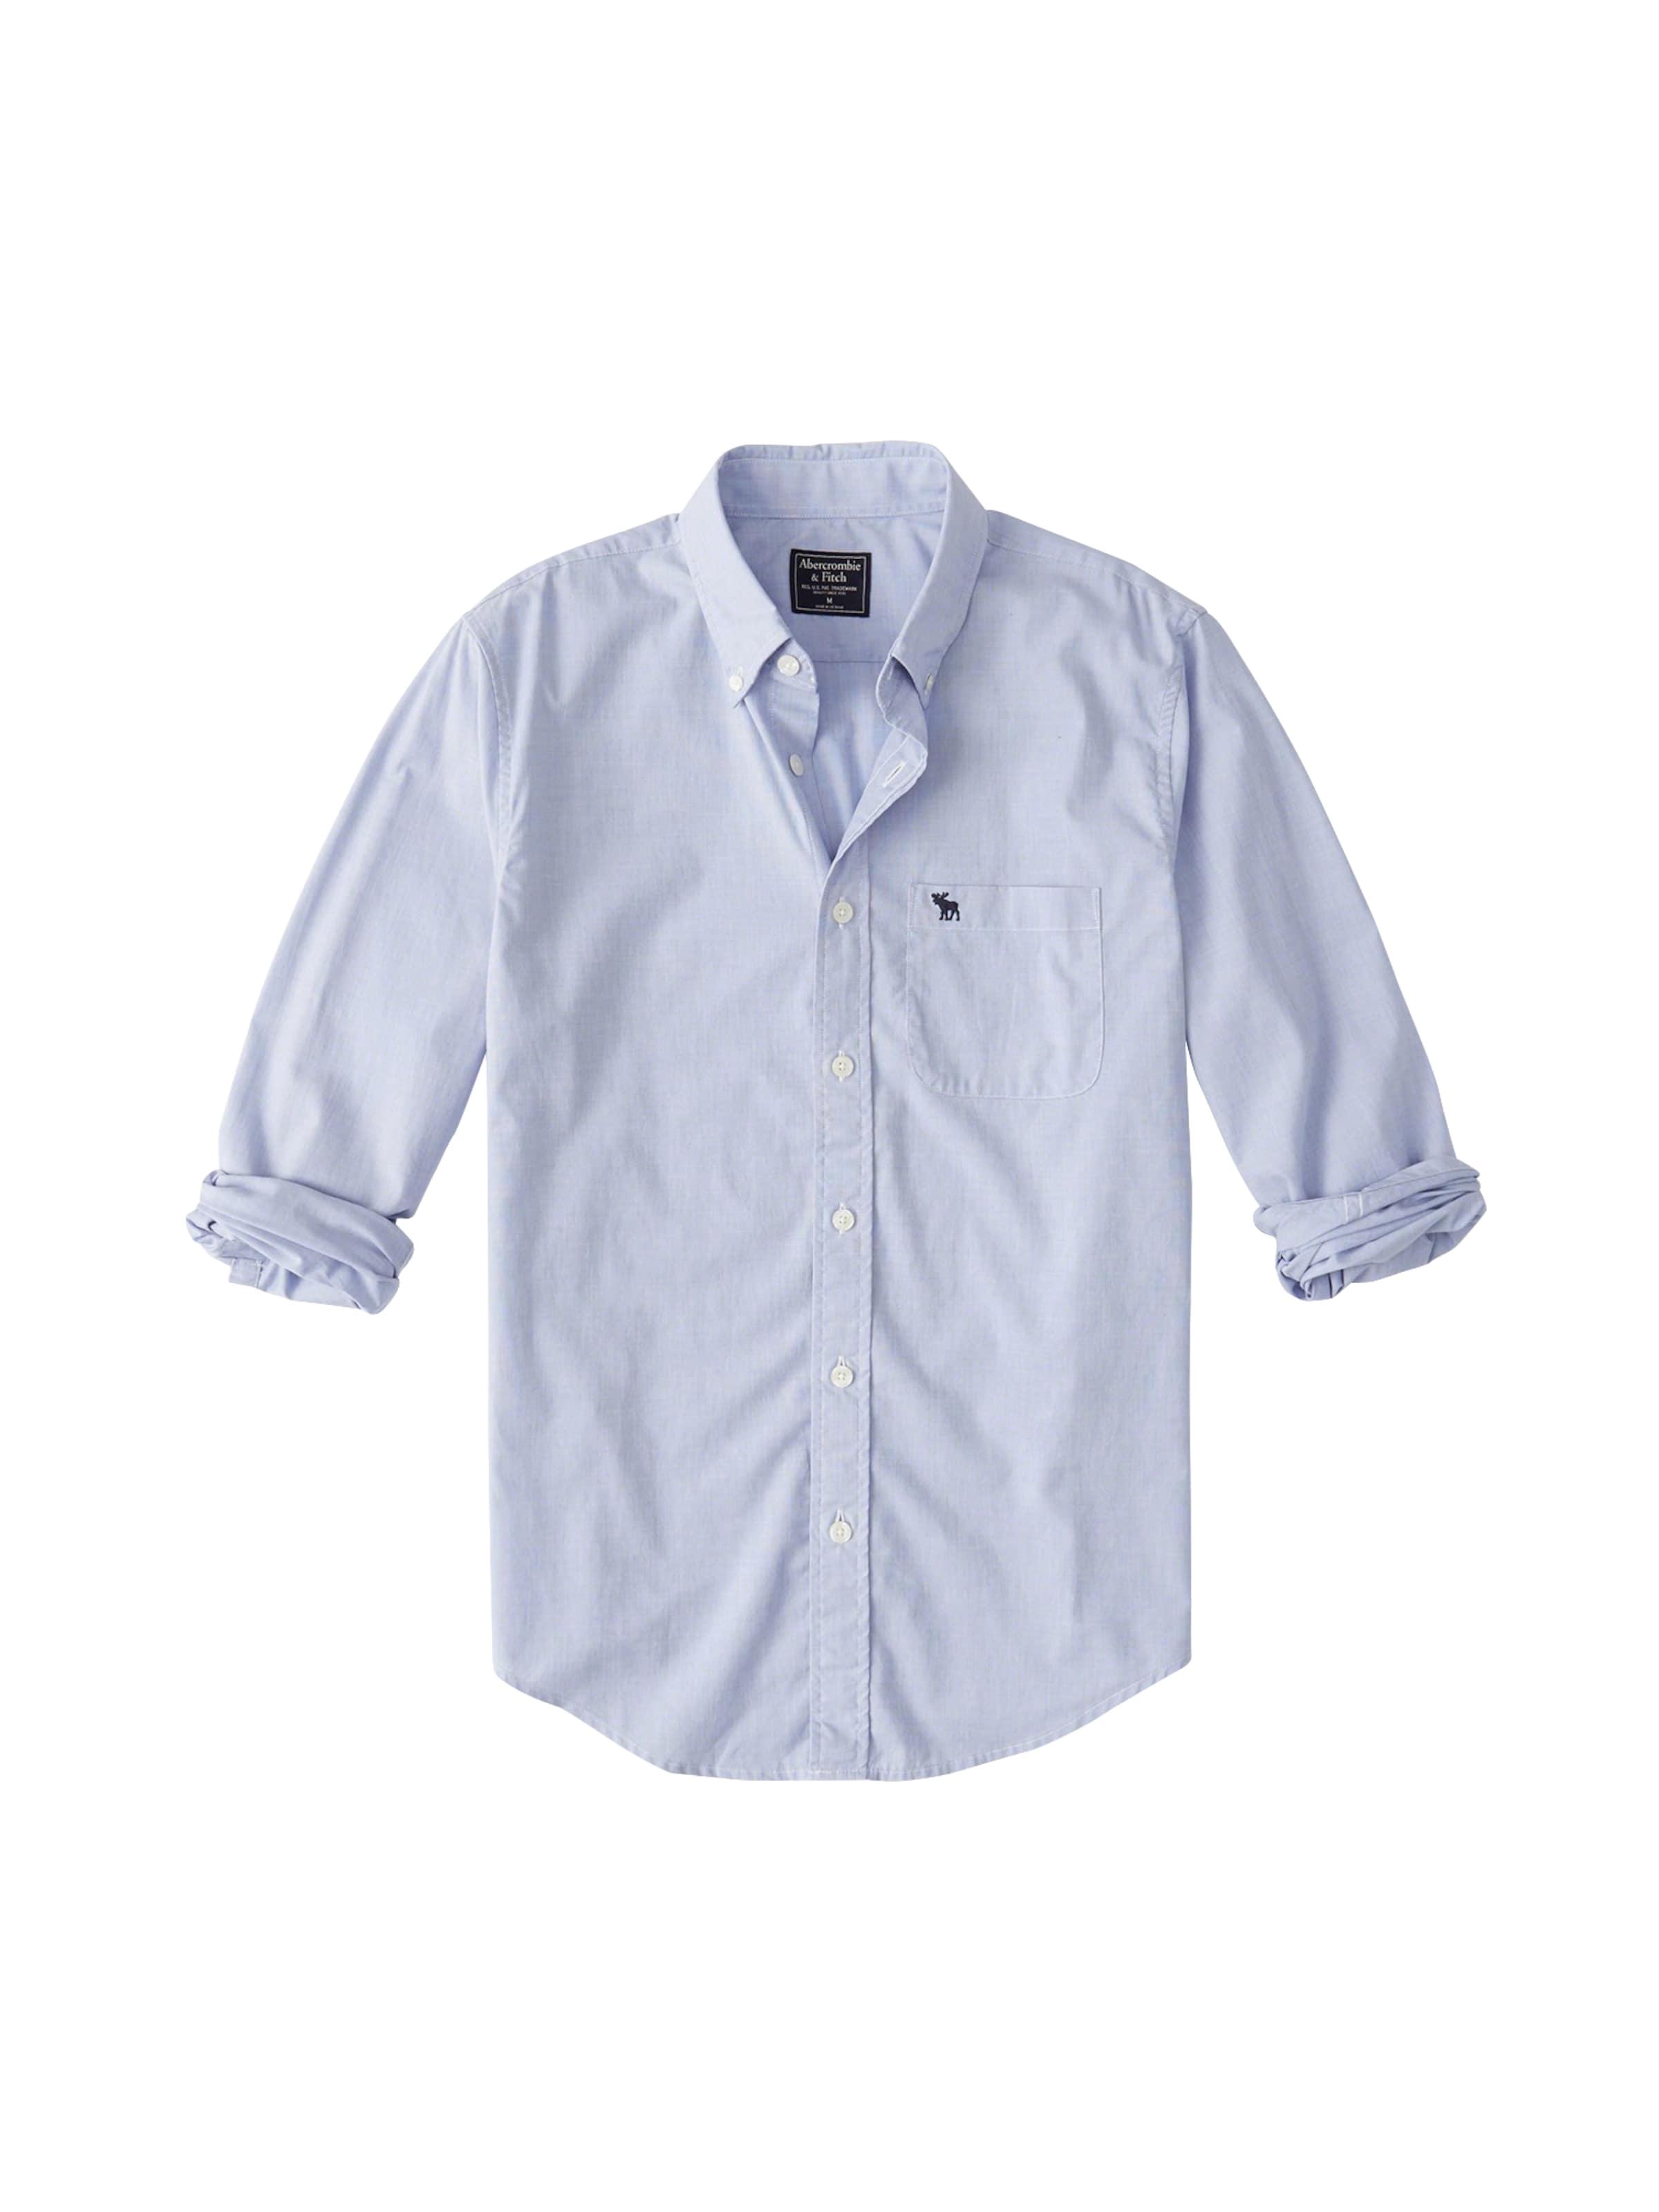 Update' Fitch Chemise En Abercrombieamp; Bleu Poplin Moose Shirt 'icon ZPuOikX